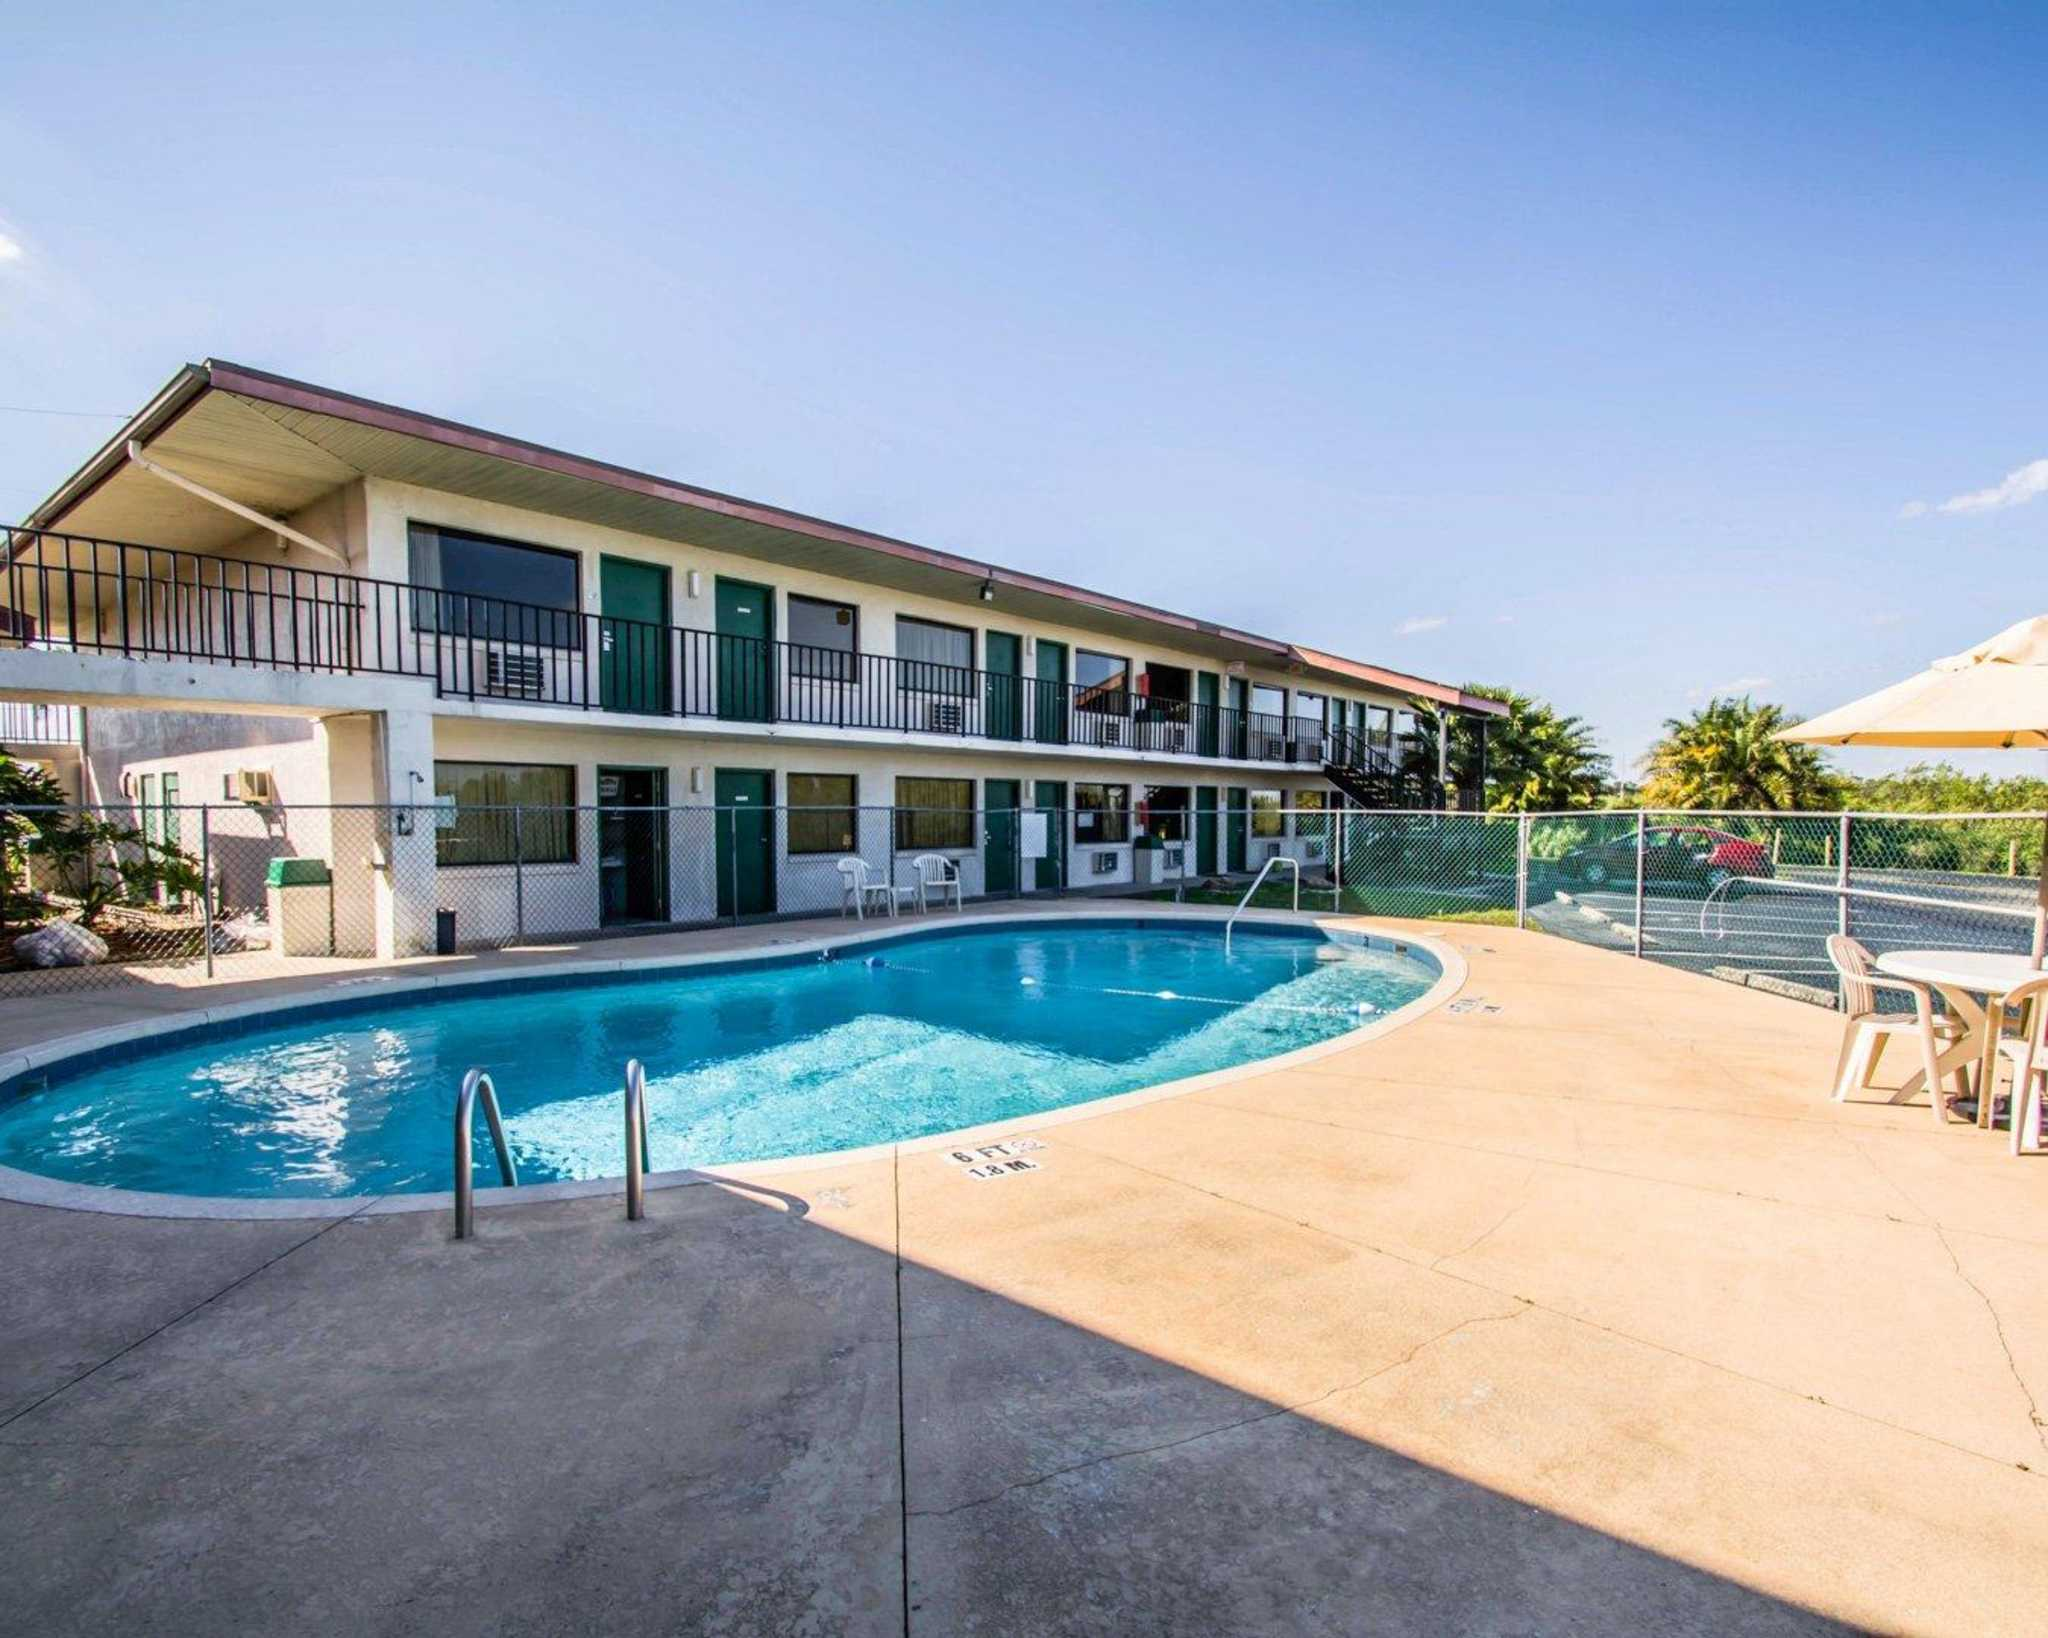 Hotels Near Sebring Fl